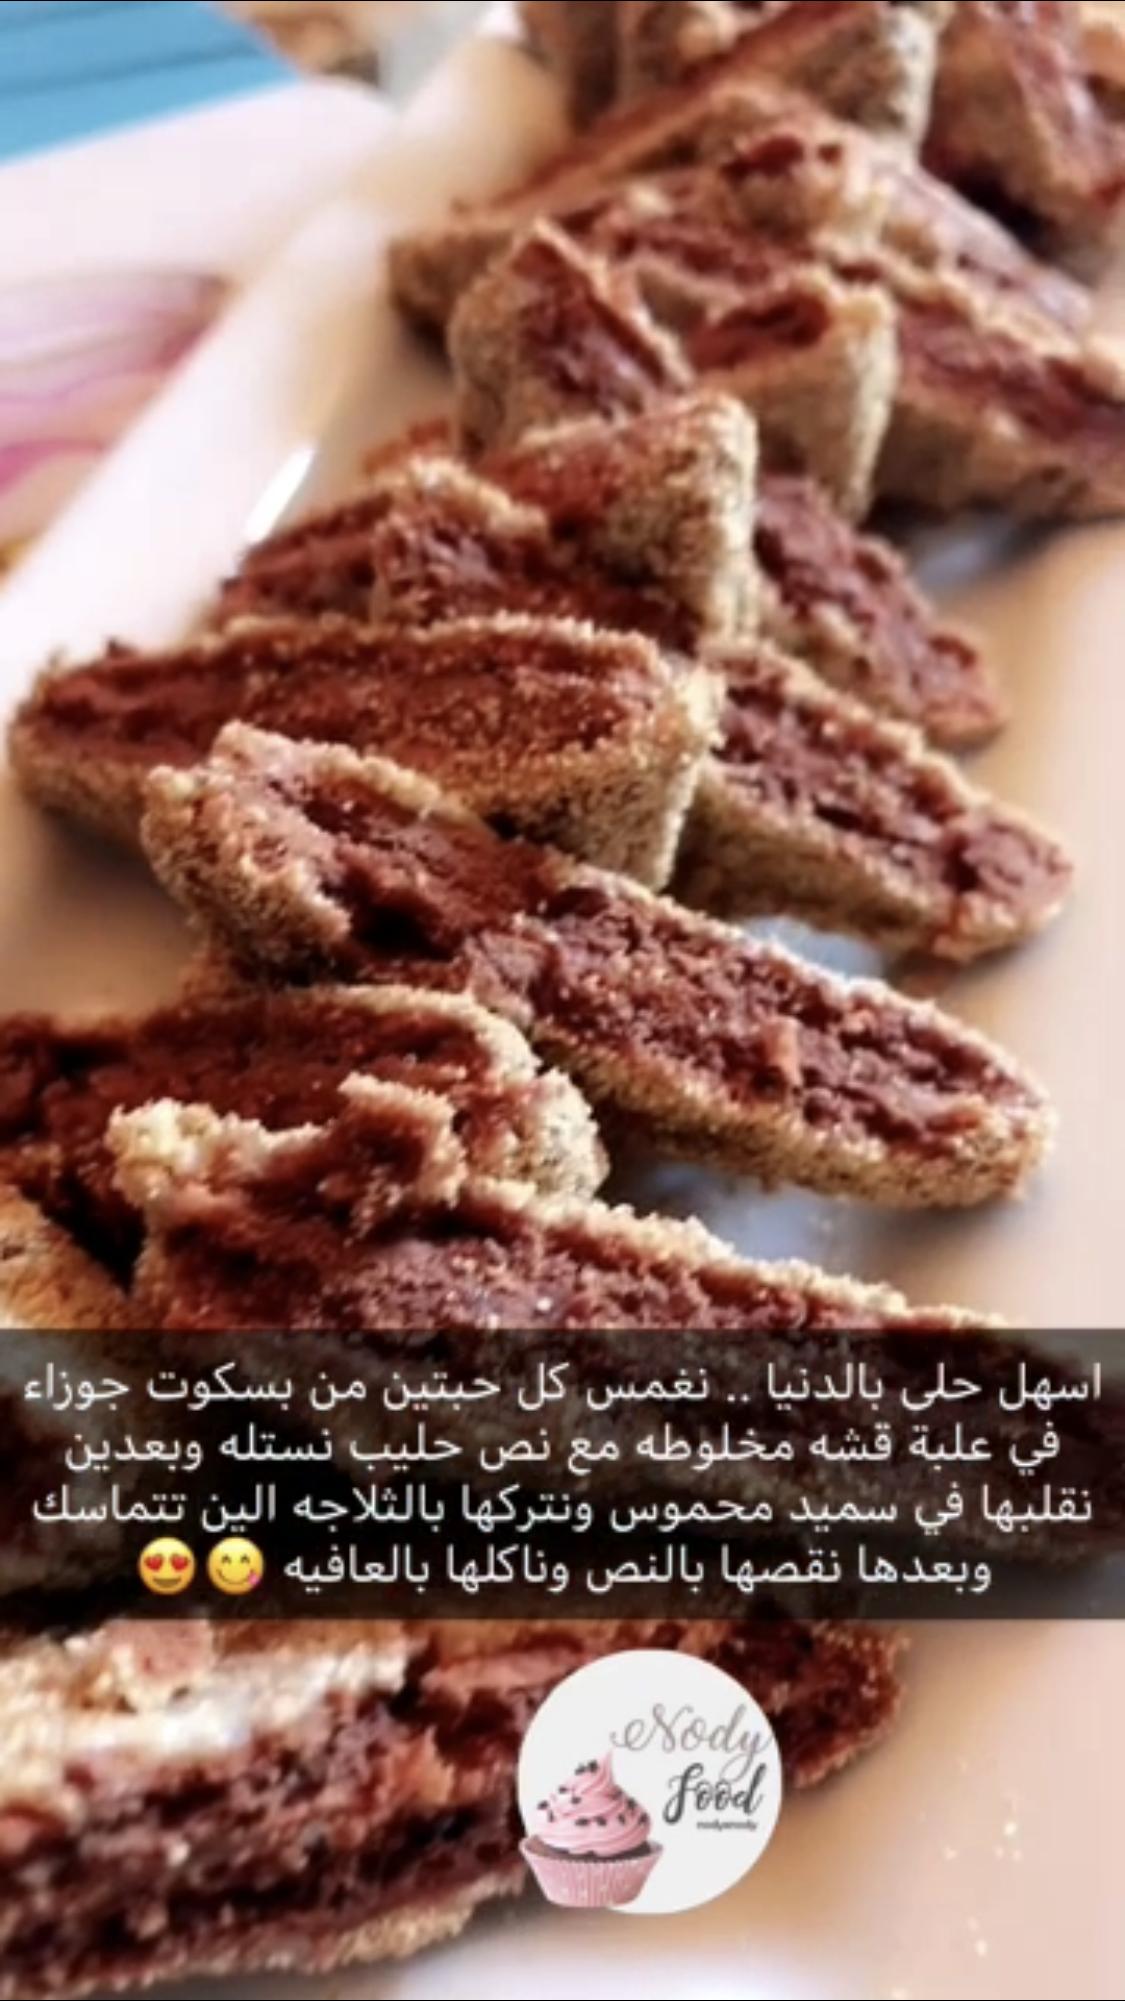 Pin By Fofa Dizayn On سناب نوديتا Arabic Sweets Cooking Recipes Food